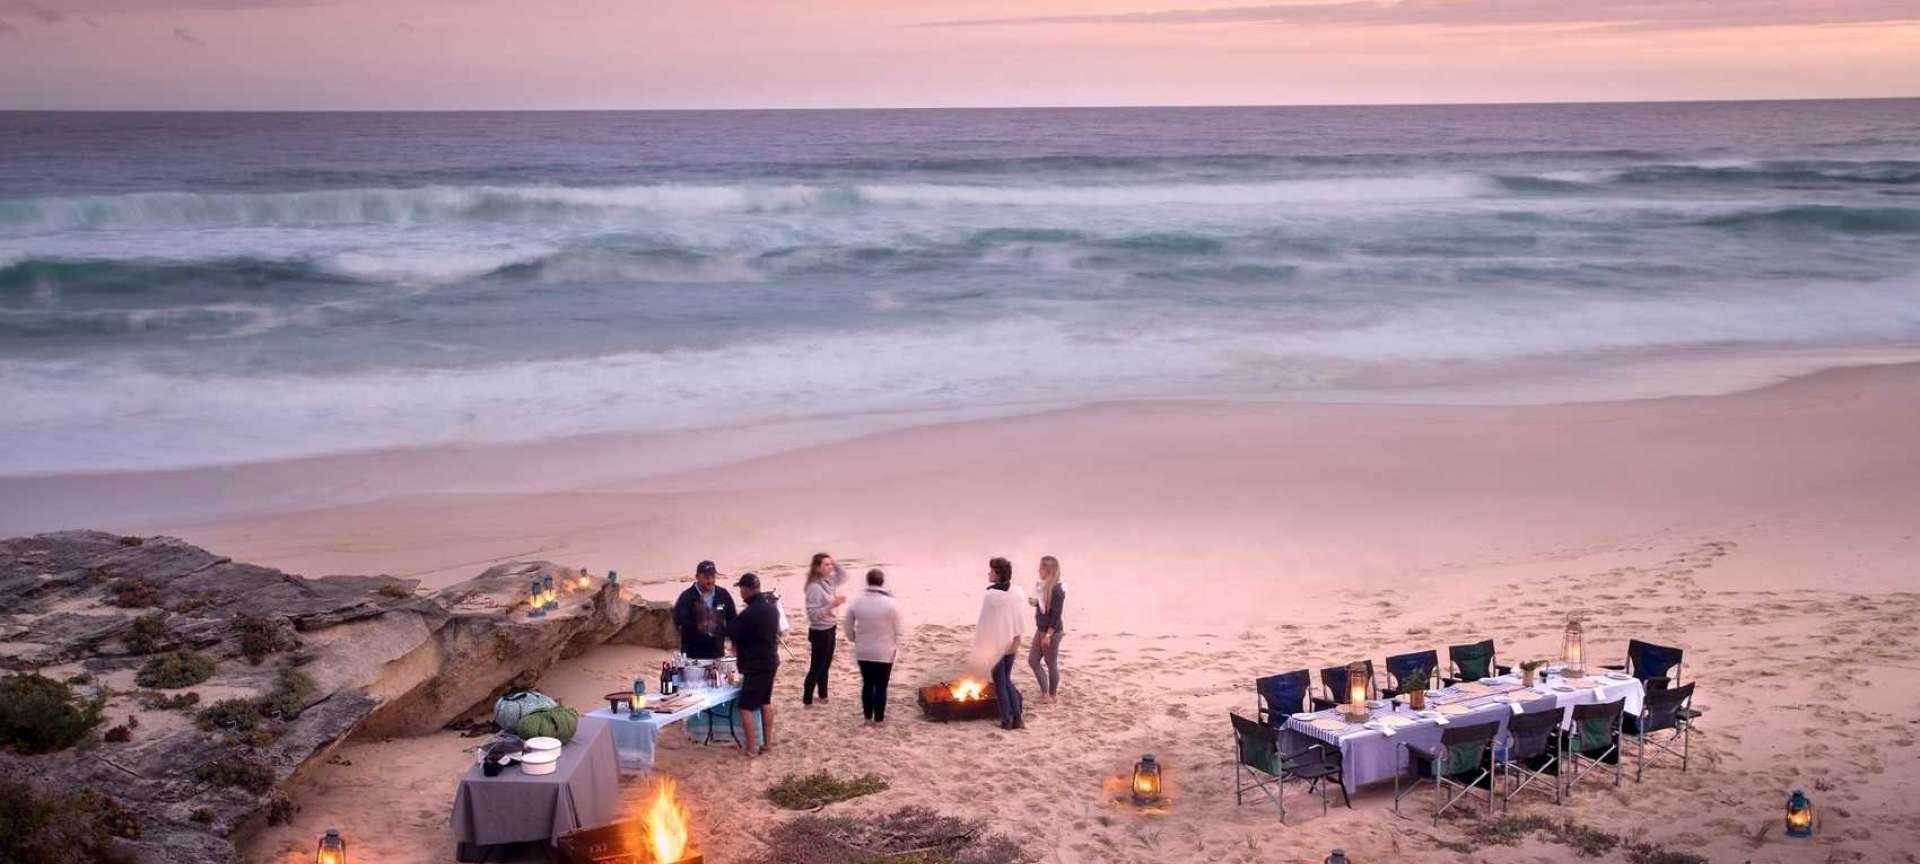 Beach holidays in South Africa - Africa Wildlife Safaris